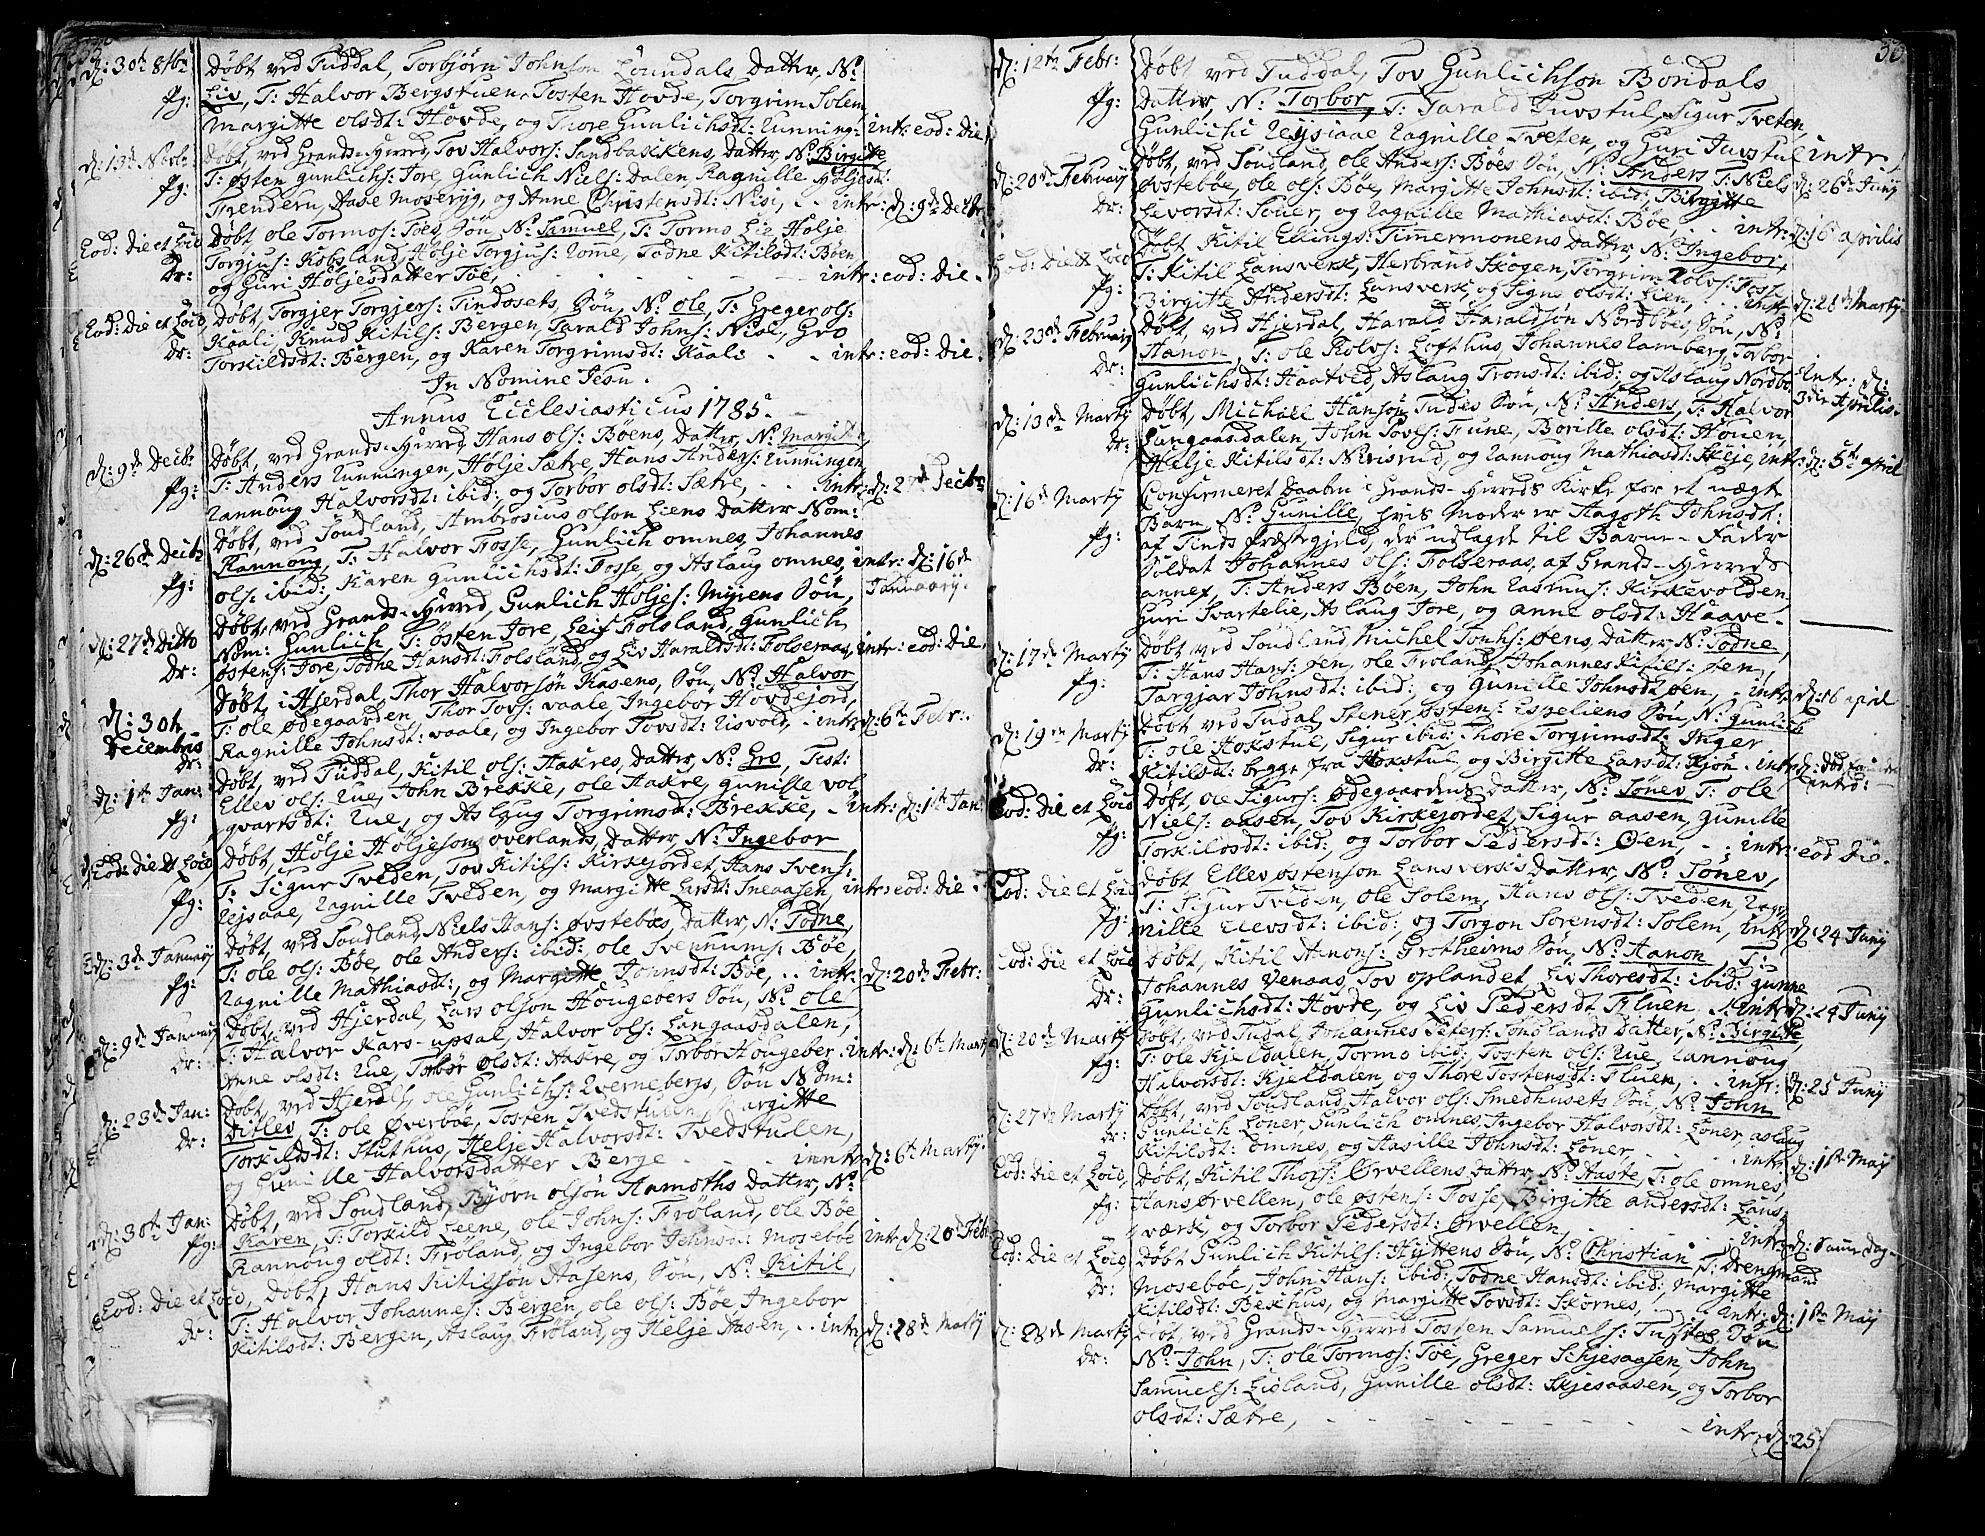 SAKO, Hjartdal kirkebøker, F/Fa/L0005: Ministerialbok nr. I 5, 1776-1801, s. 55-56